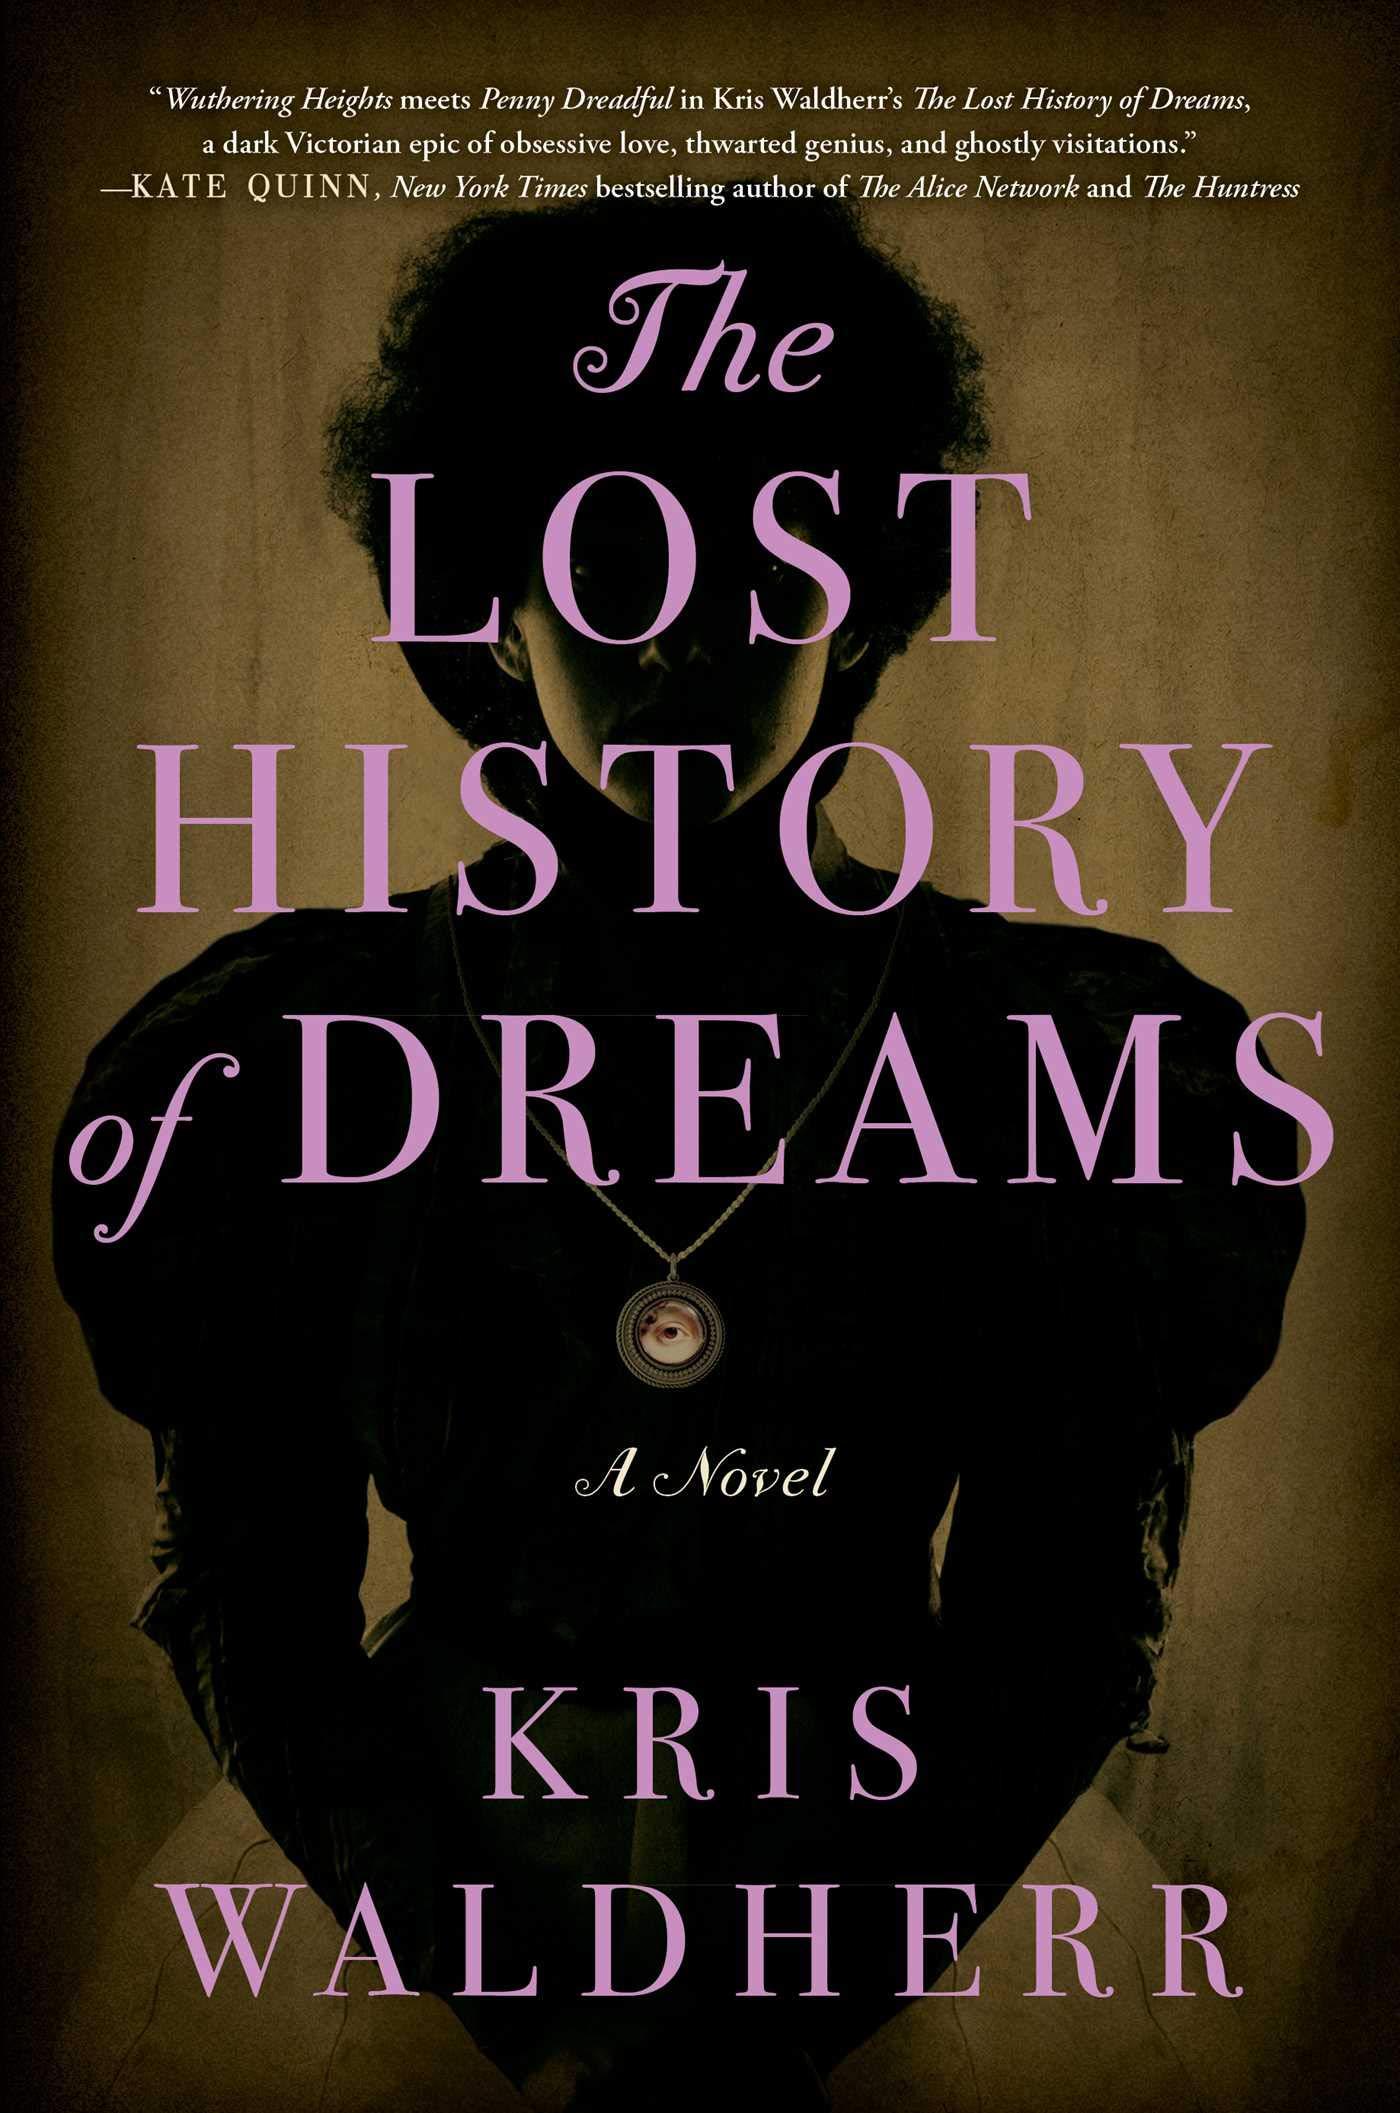 Author Interview - Kris Waldherr